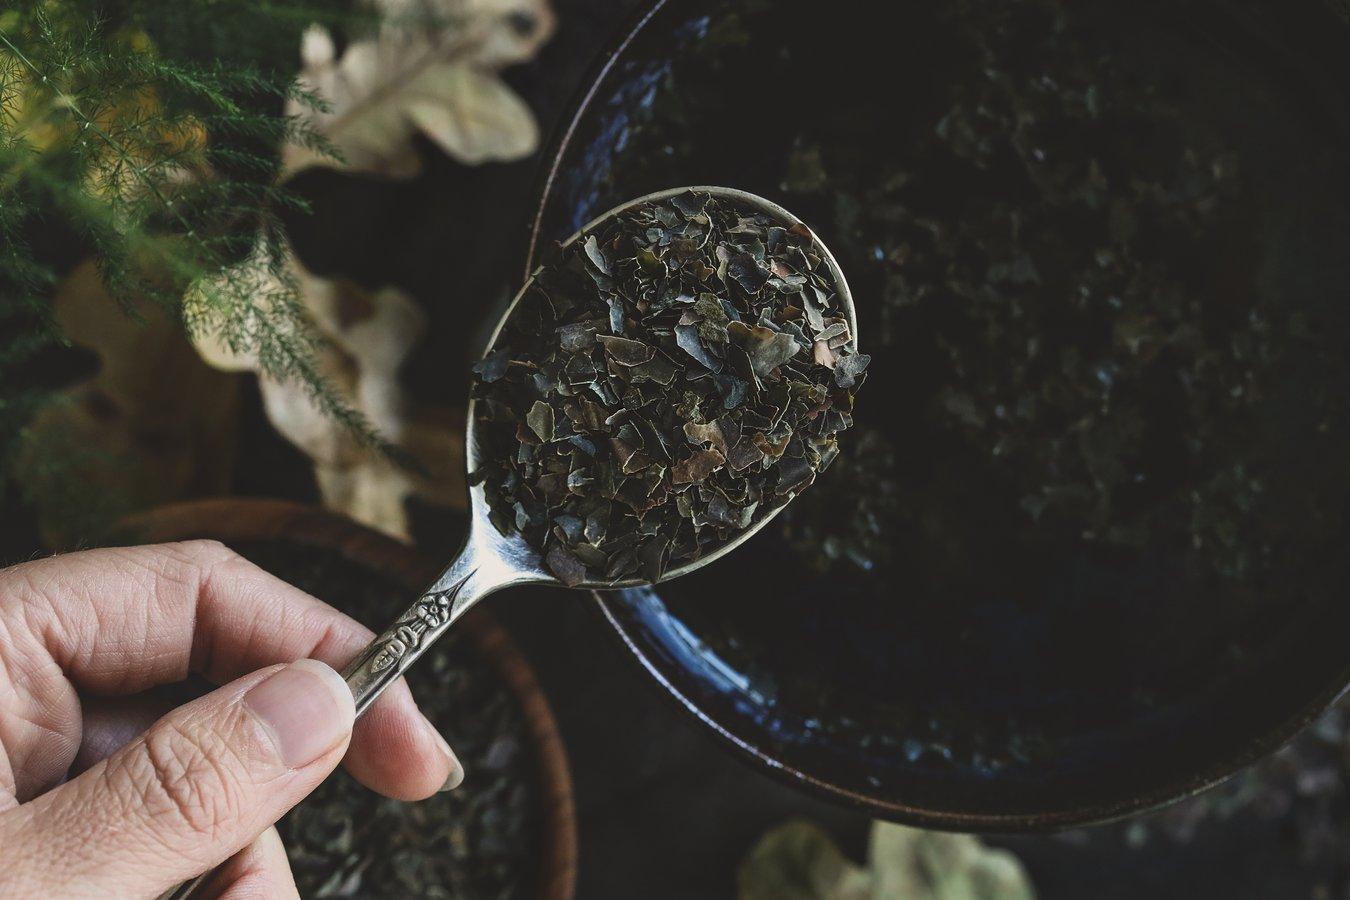 A spoonful of kombu seaweed flakes.